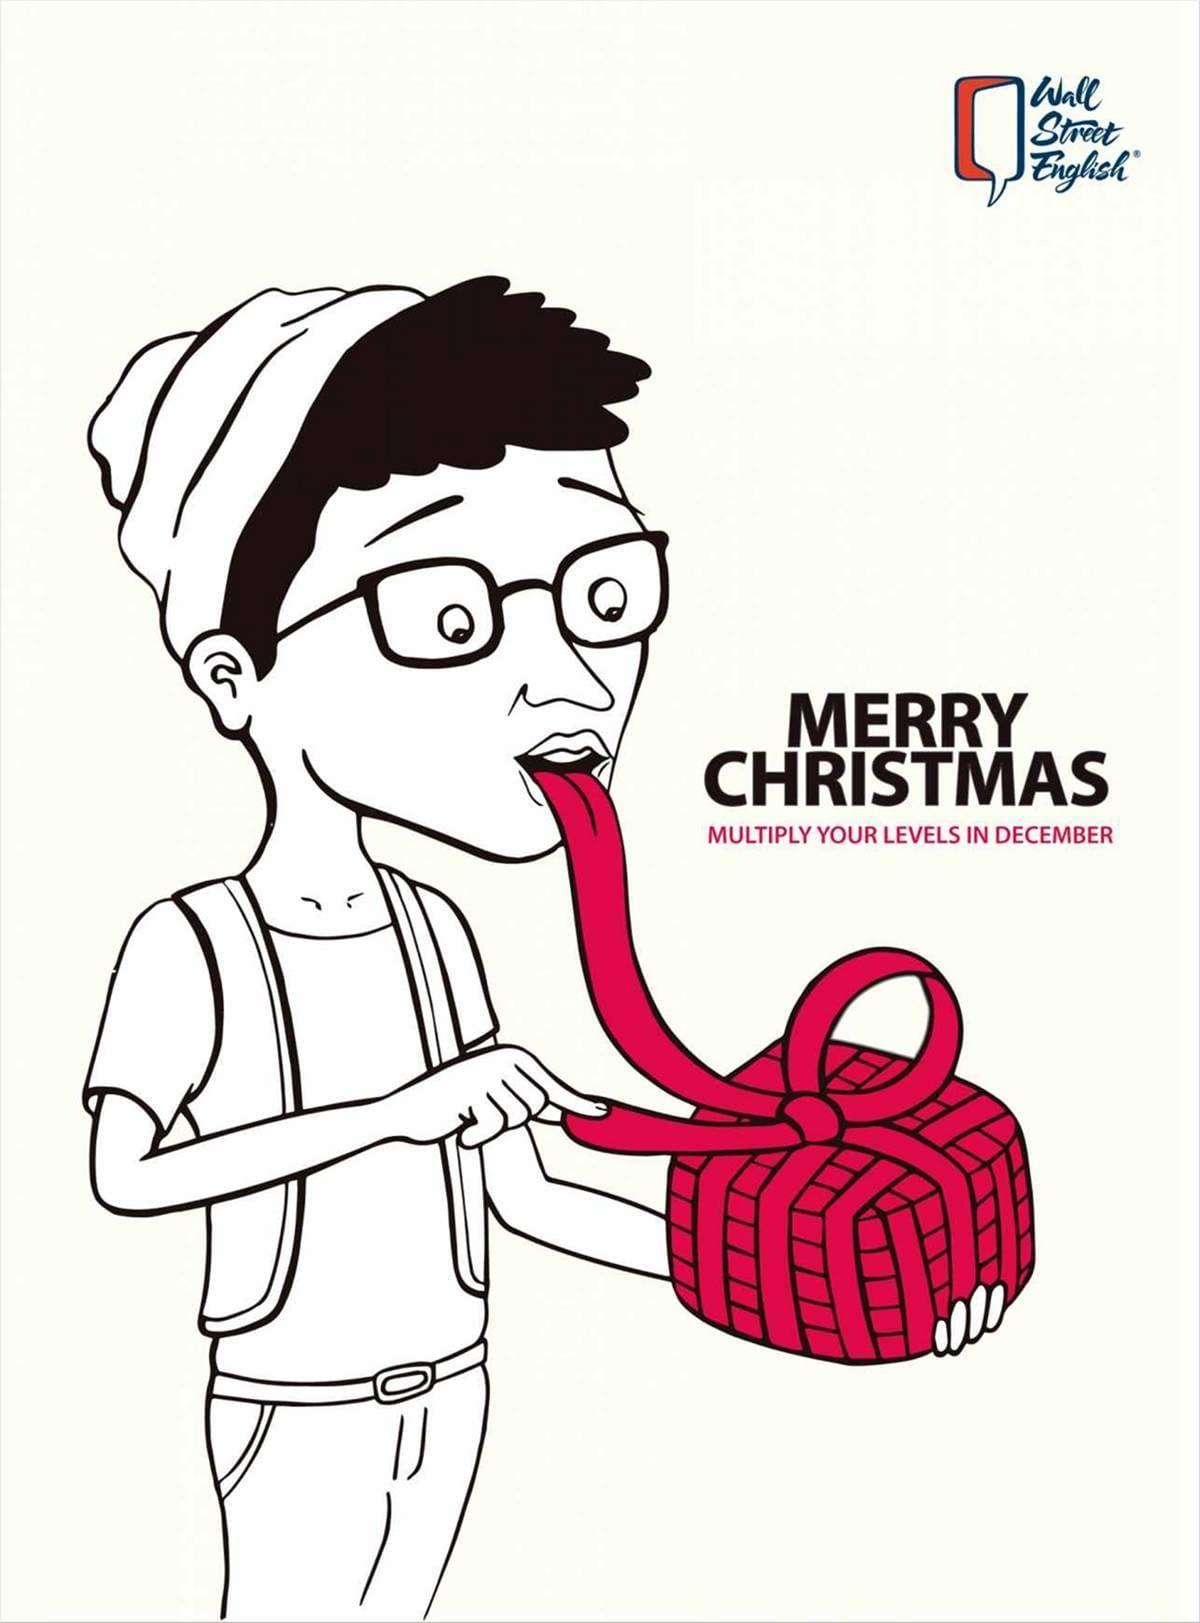 Wall Street English: Merry Christmas Wall Street English ads